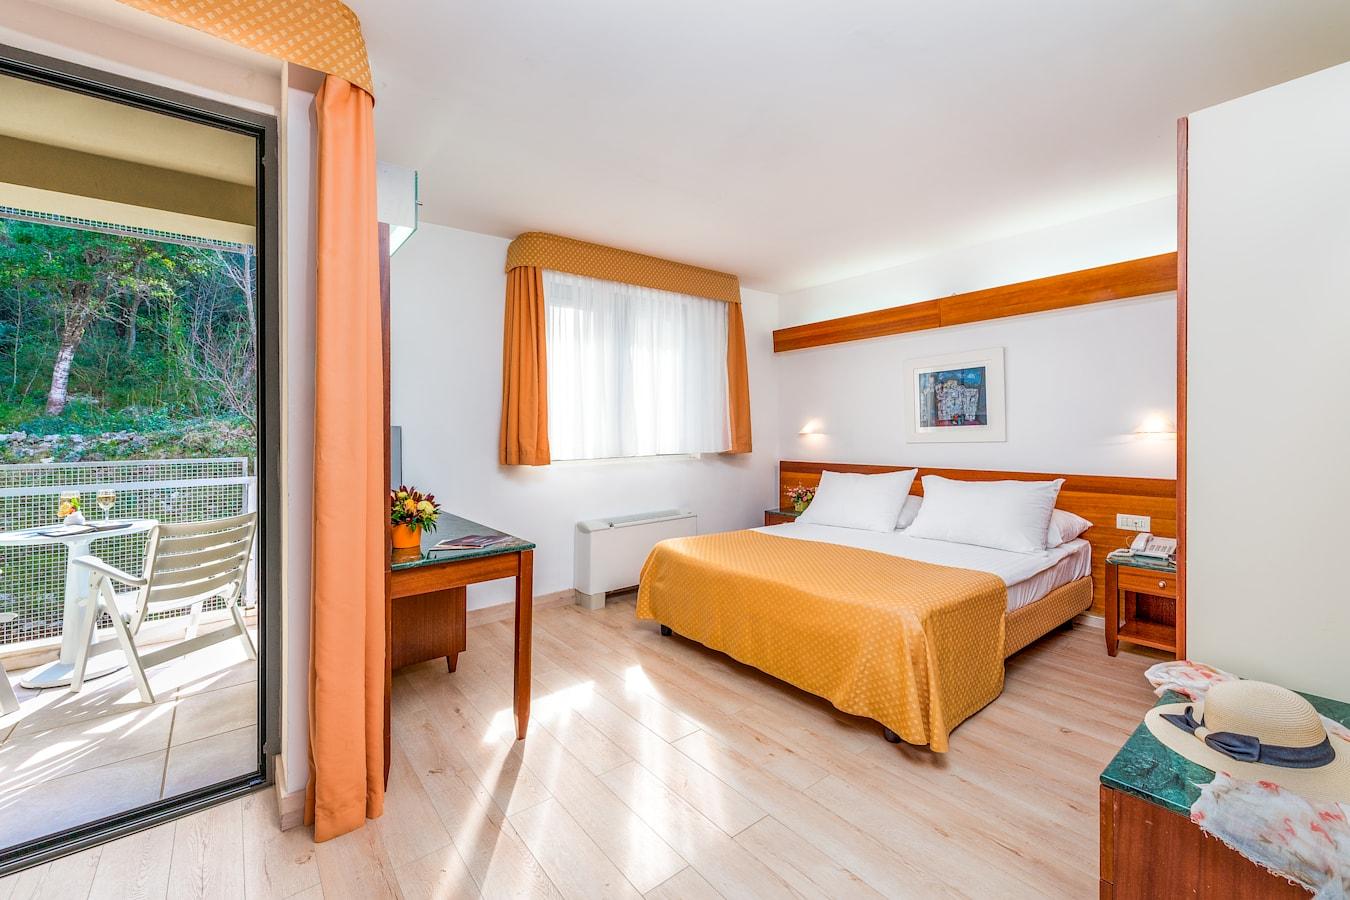 uvala-hotel-dubrovnik-double-room-balcony-park-side.jpg